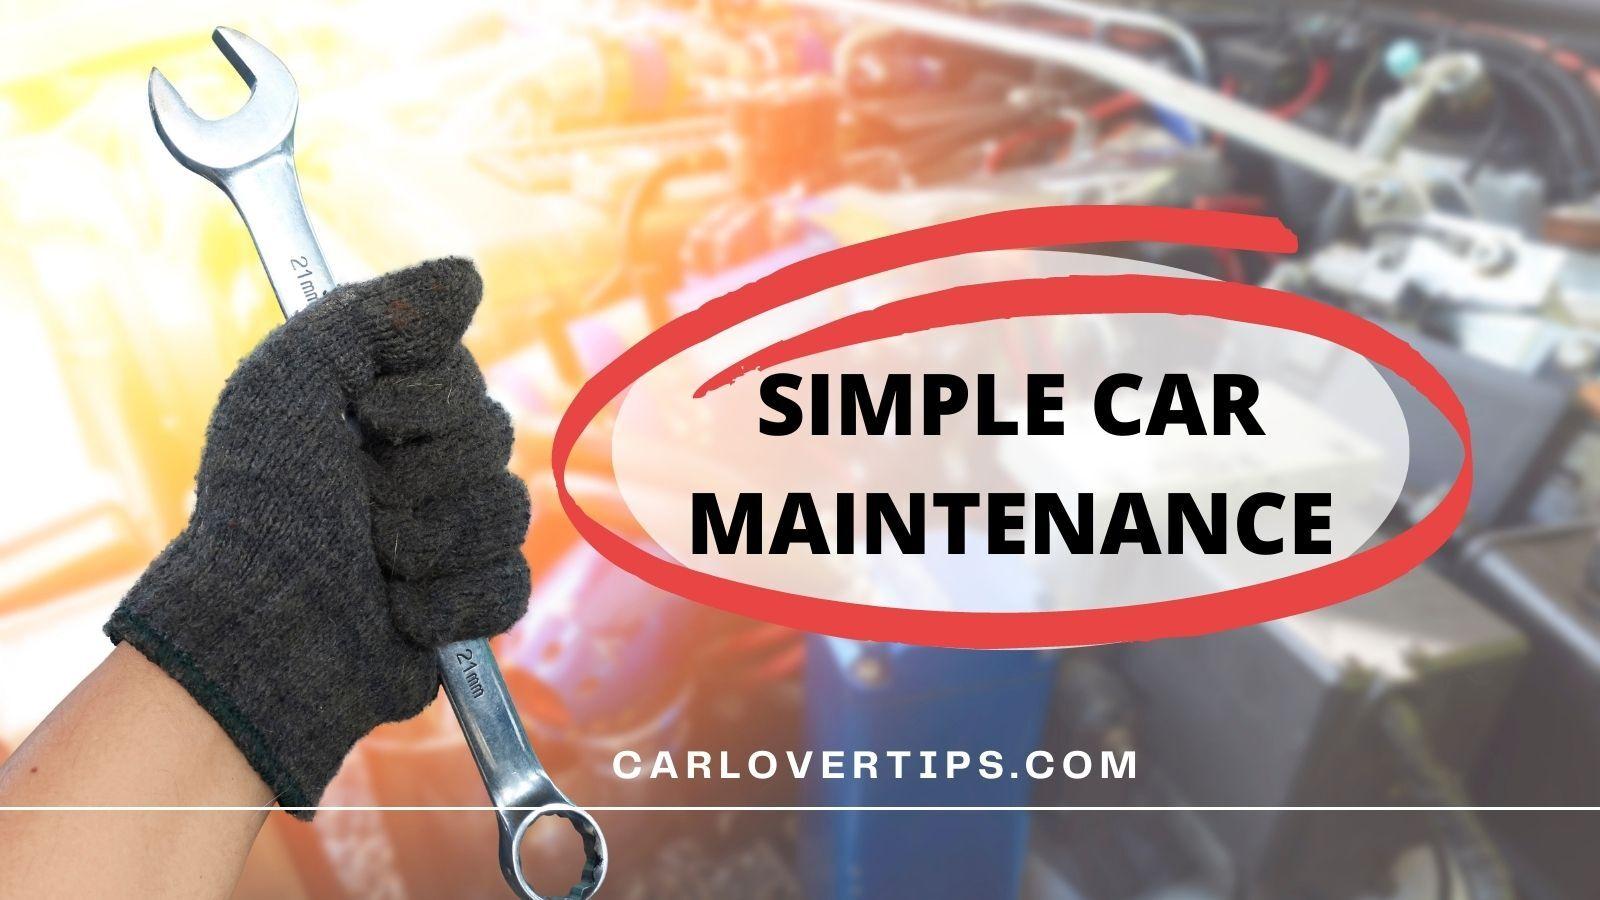 Simple Car Maintenance